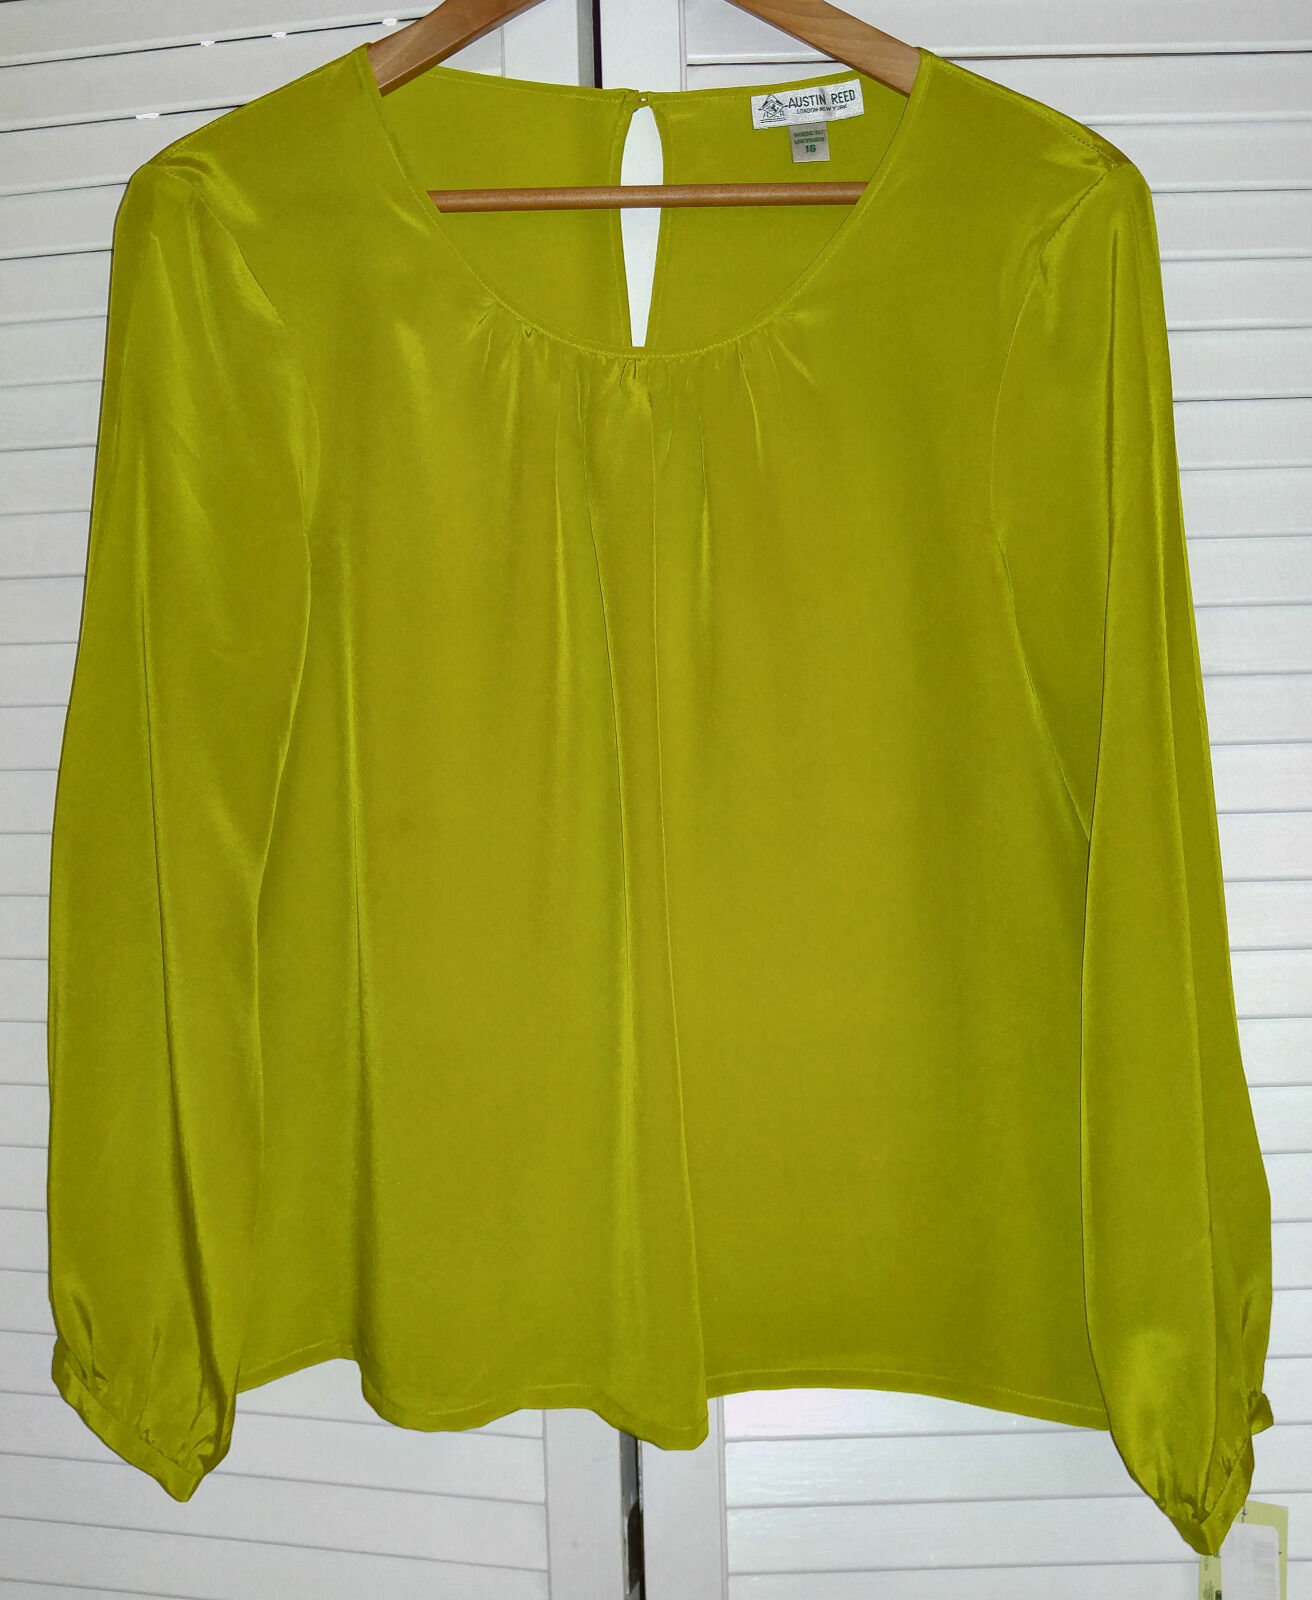 Austin Reed Lime Grün Gelb Silk Blouse Top Shirt Größe 16 NWT Long sleeve